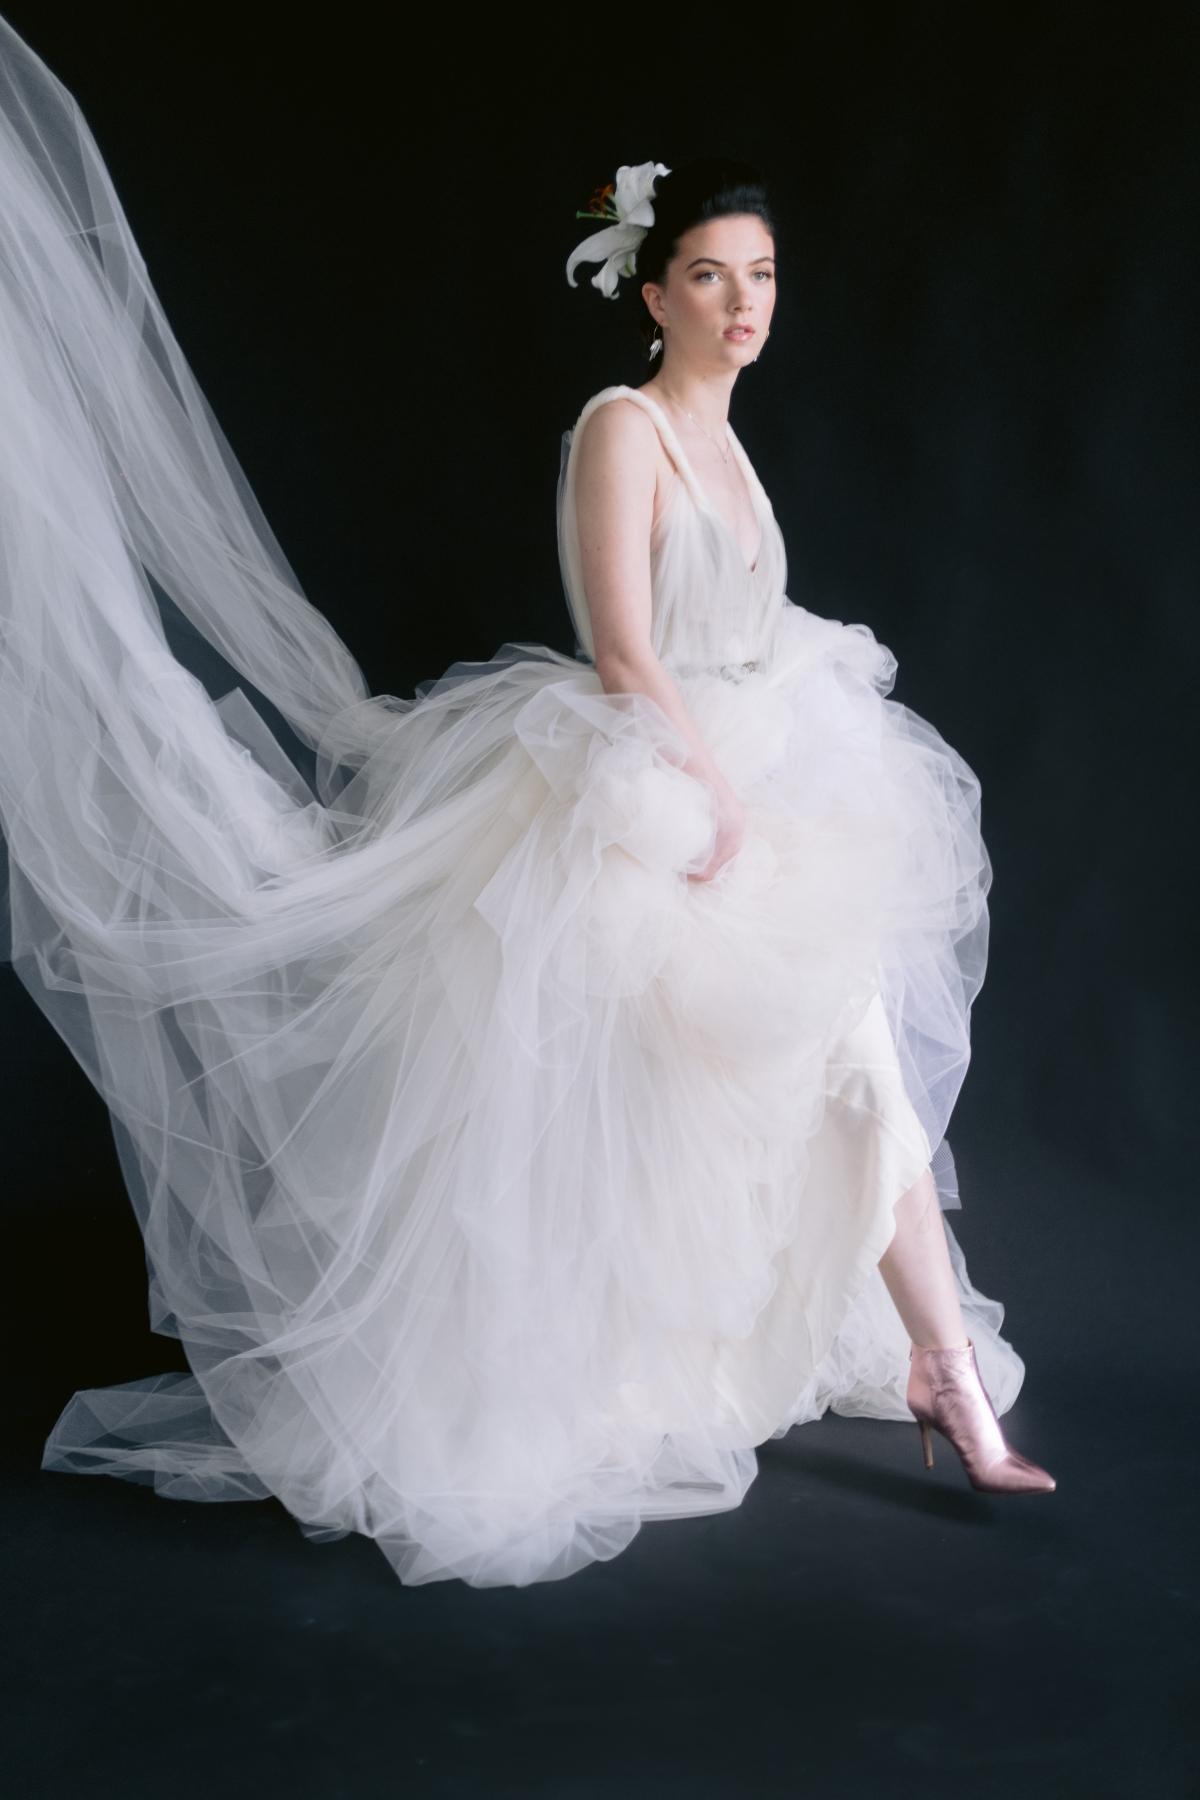 Laura Lanzerotte Bridal Danielle Heinson Photography 65